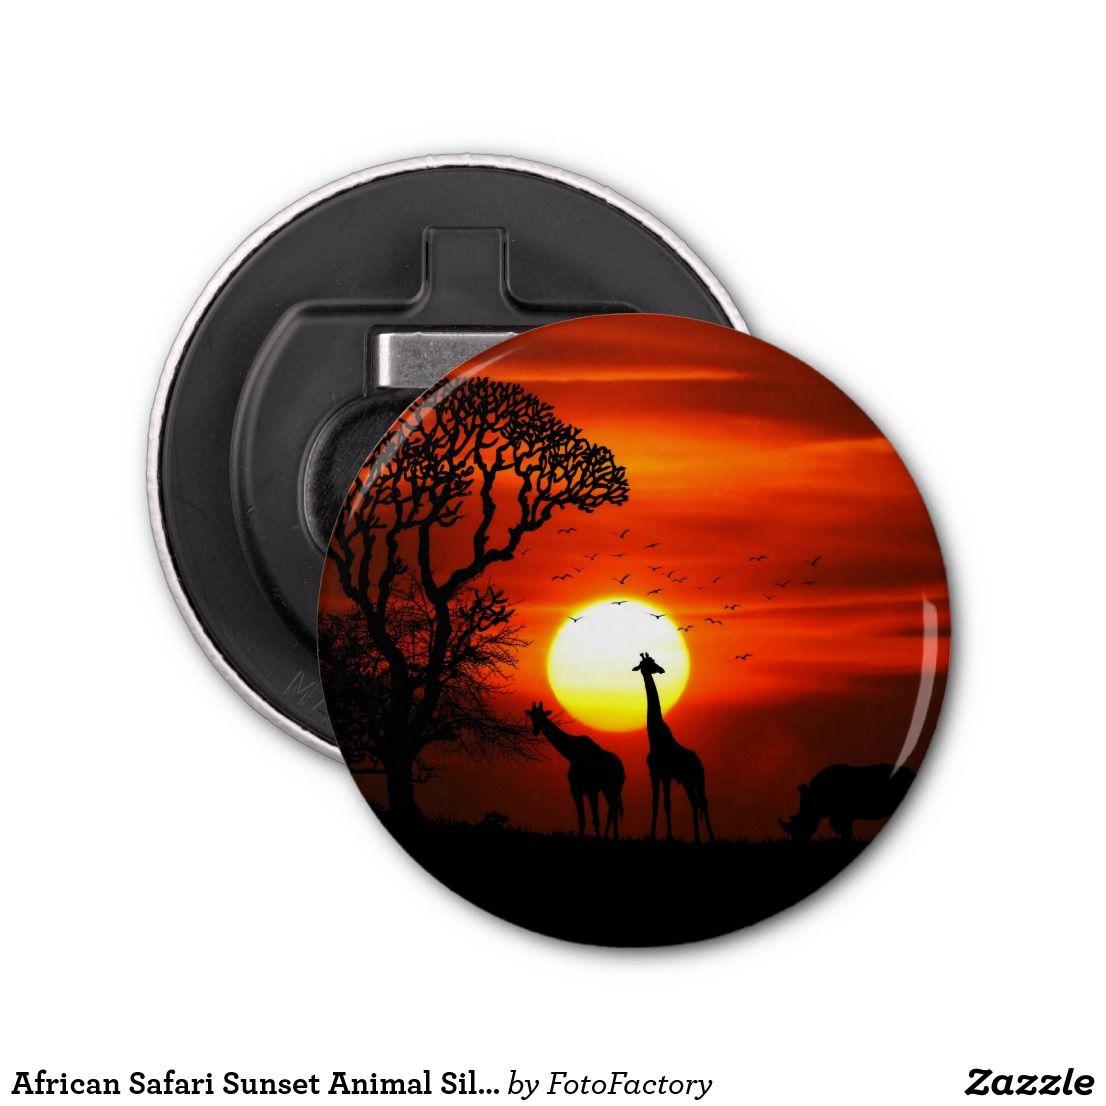 African Safari Sunset Animal Silhouettes Bottle Opener Zazzle Com Animal Silhouette African Safari African